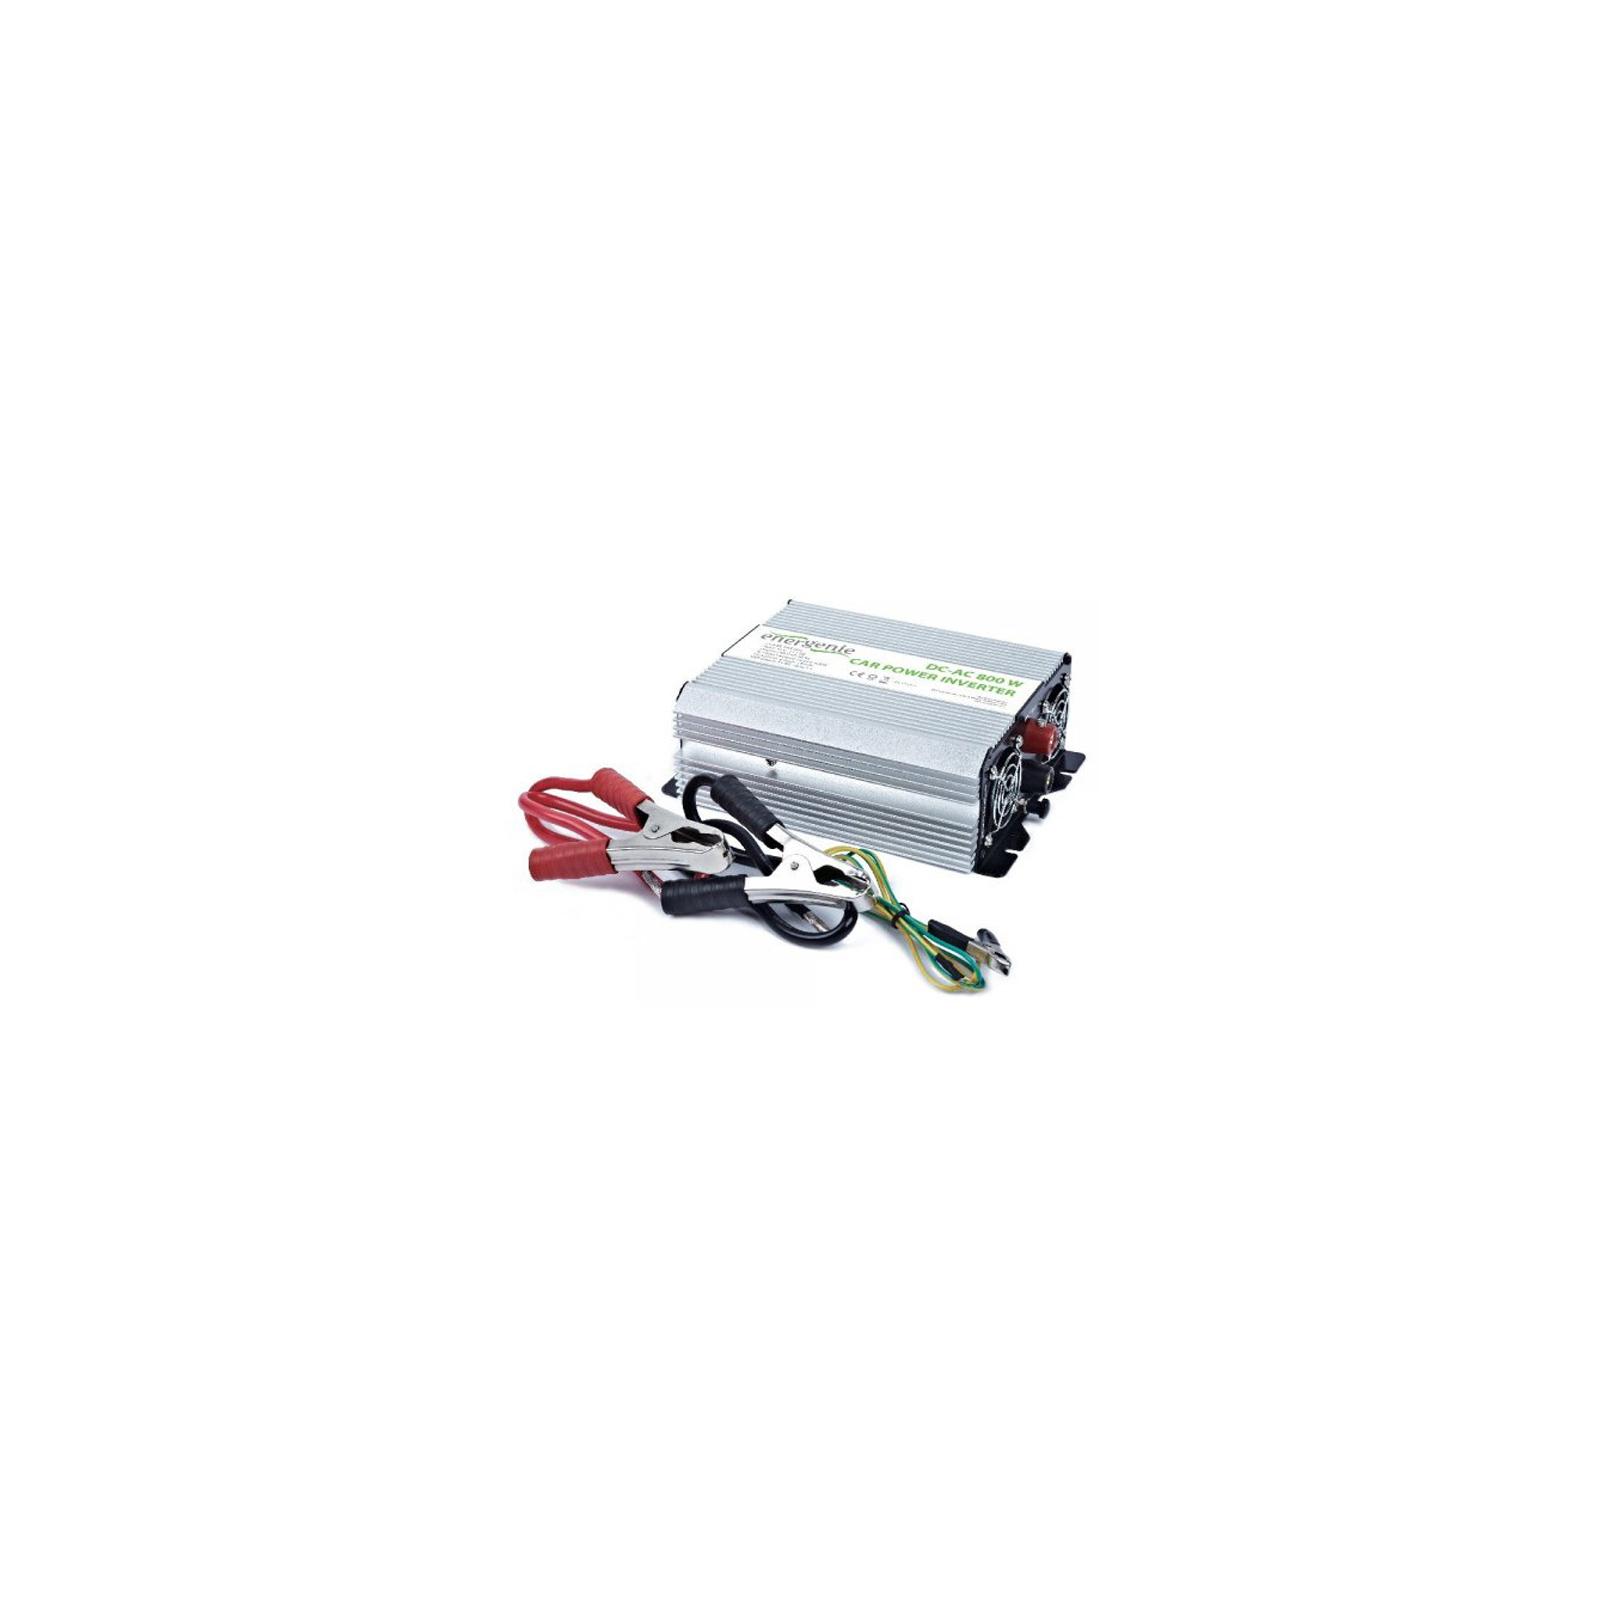 Автомобильный инвертор 12V/220V 800 Вт EnerGenie (EG-PWC-034)